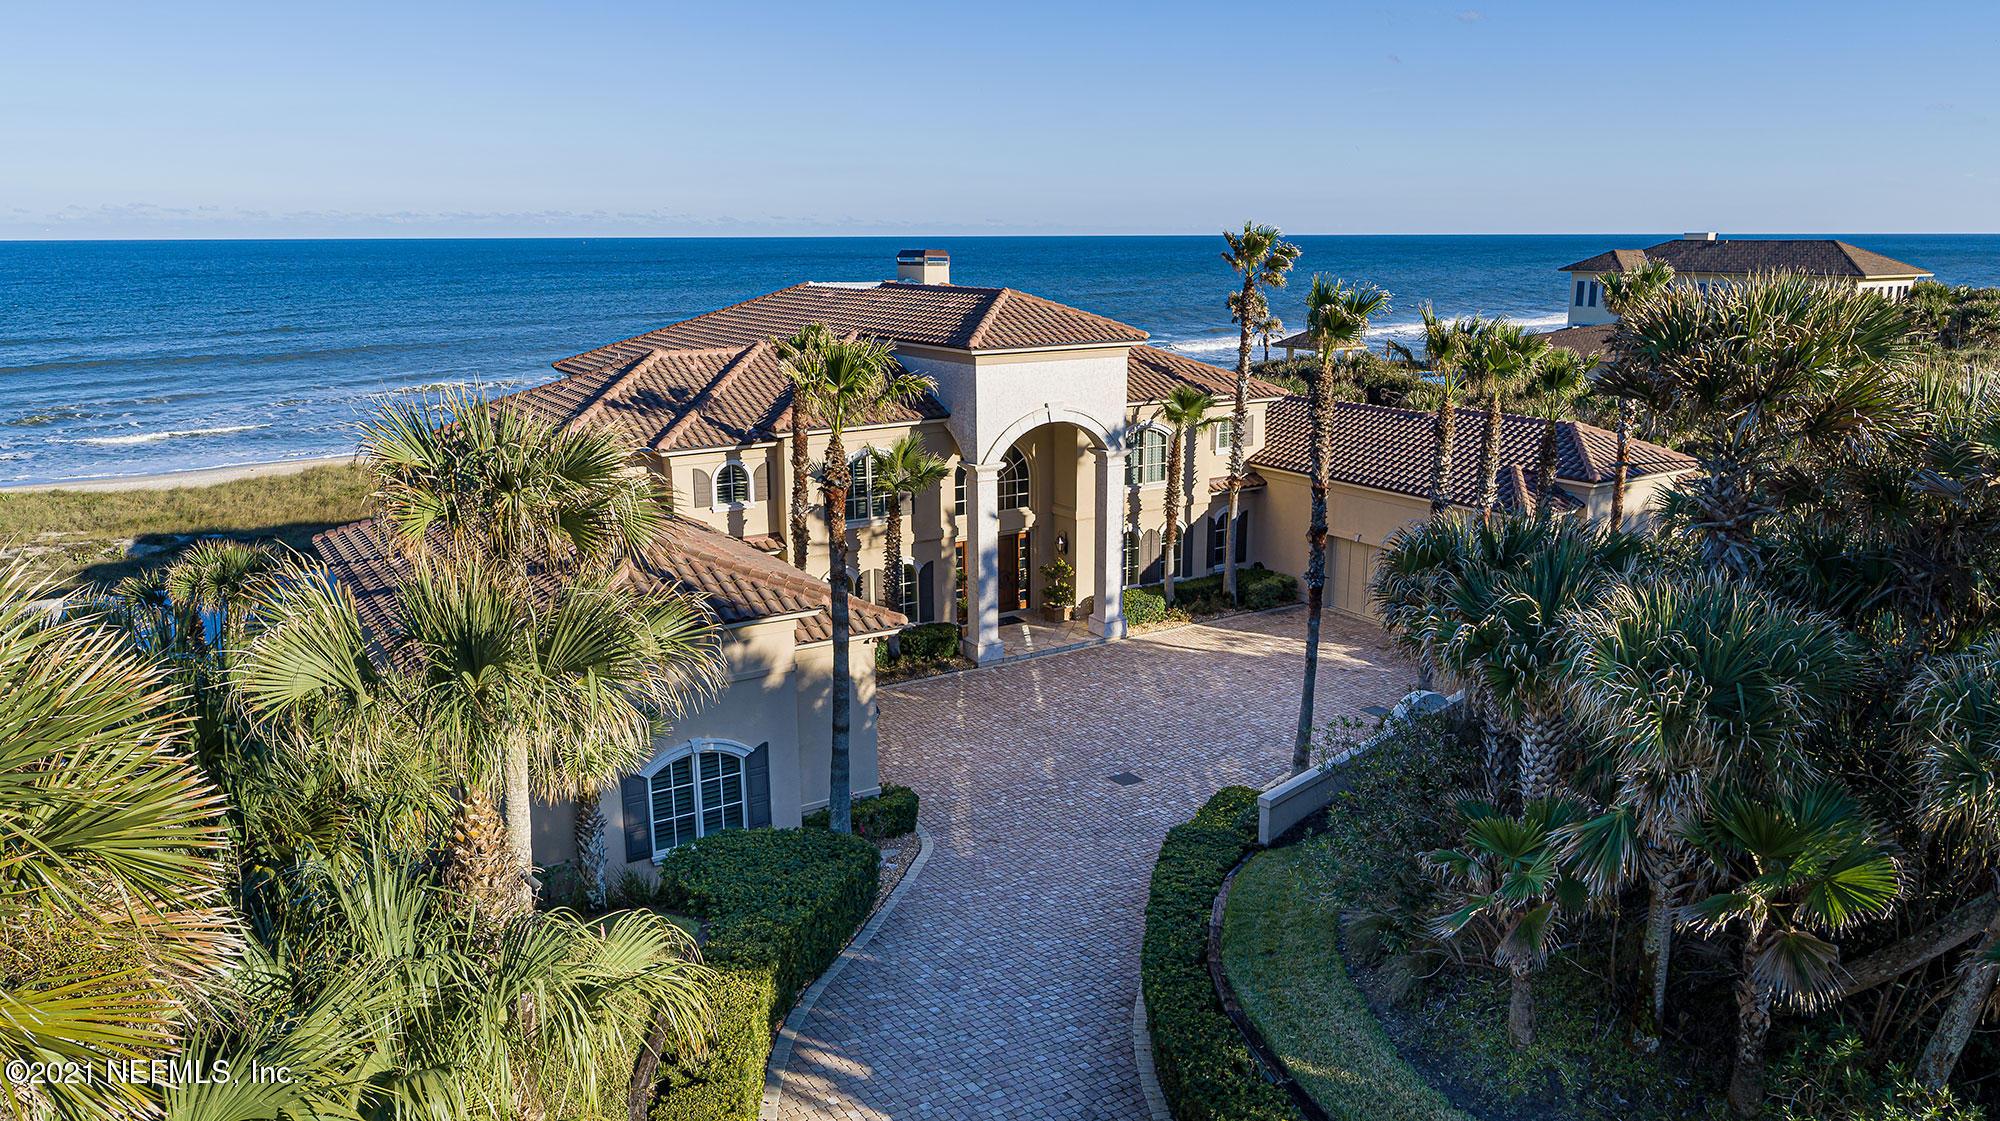 1159 PONTE VEDRA, PONTE VEDRA BEACH, FLORIDA 32082, 5 Bedrooms Bedrooms, ,6 BathroomsBathrooms,Residential,For sale,PONTE VEDRA,1088364